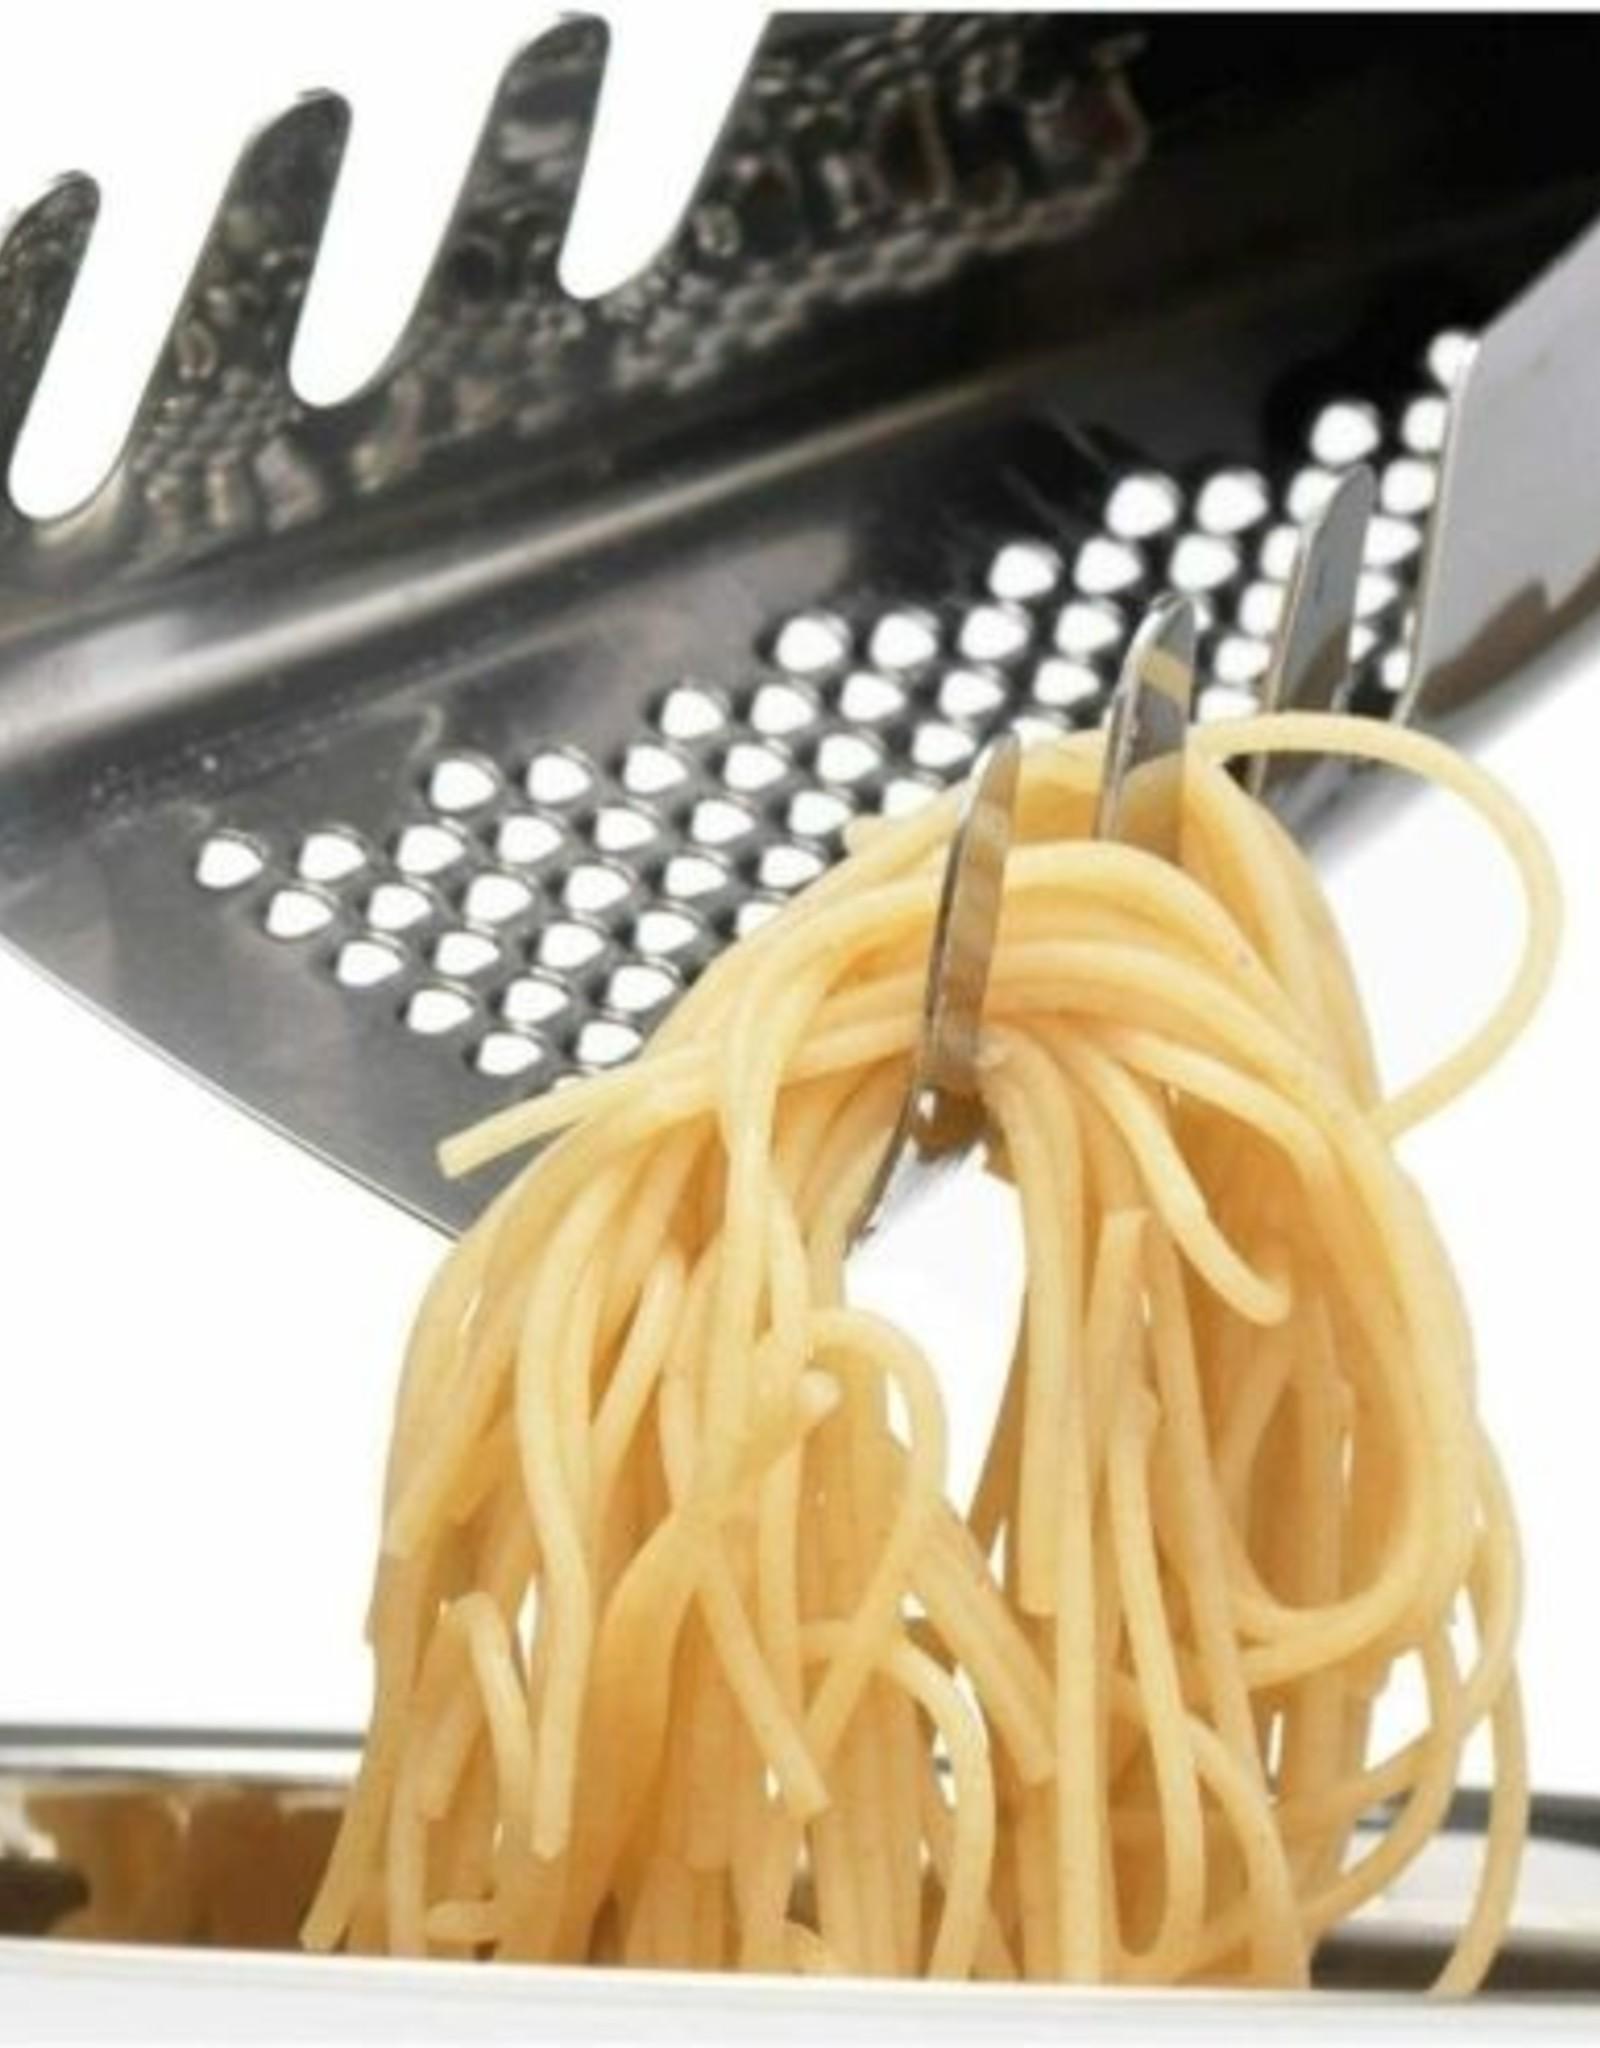 Pasta Server with Parmesan Grater